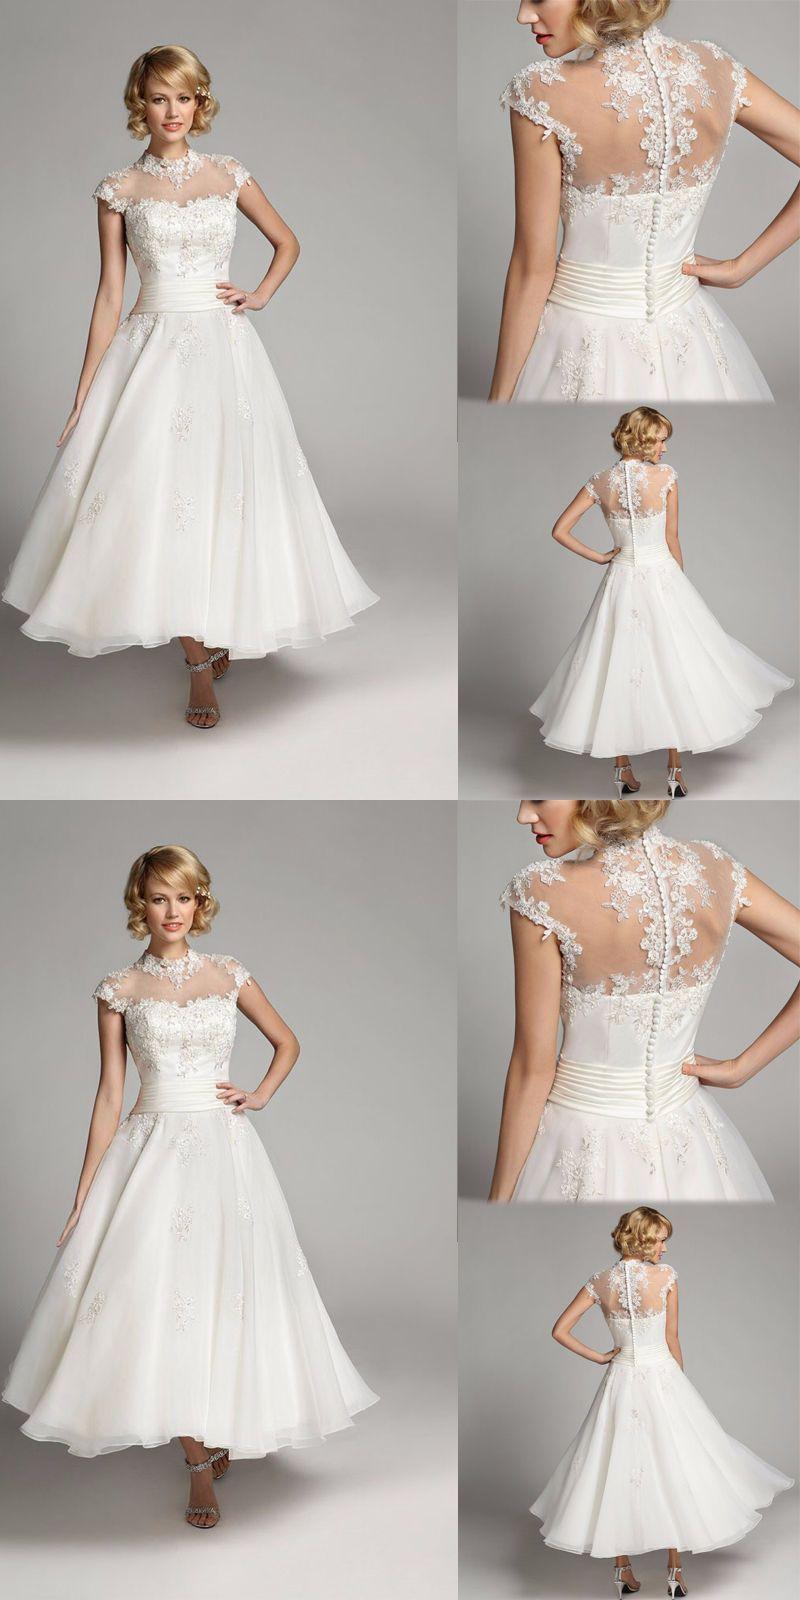 Wedding dresses vintage short wedding dress tea length white